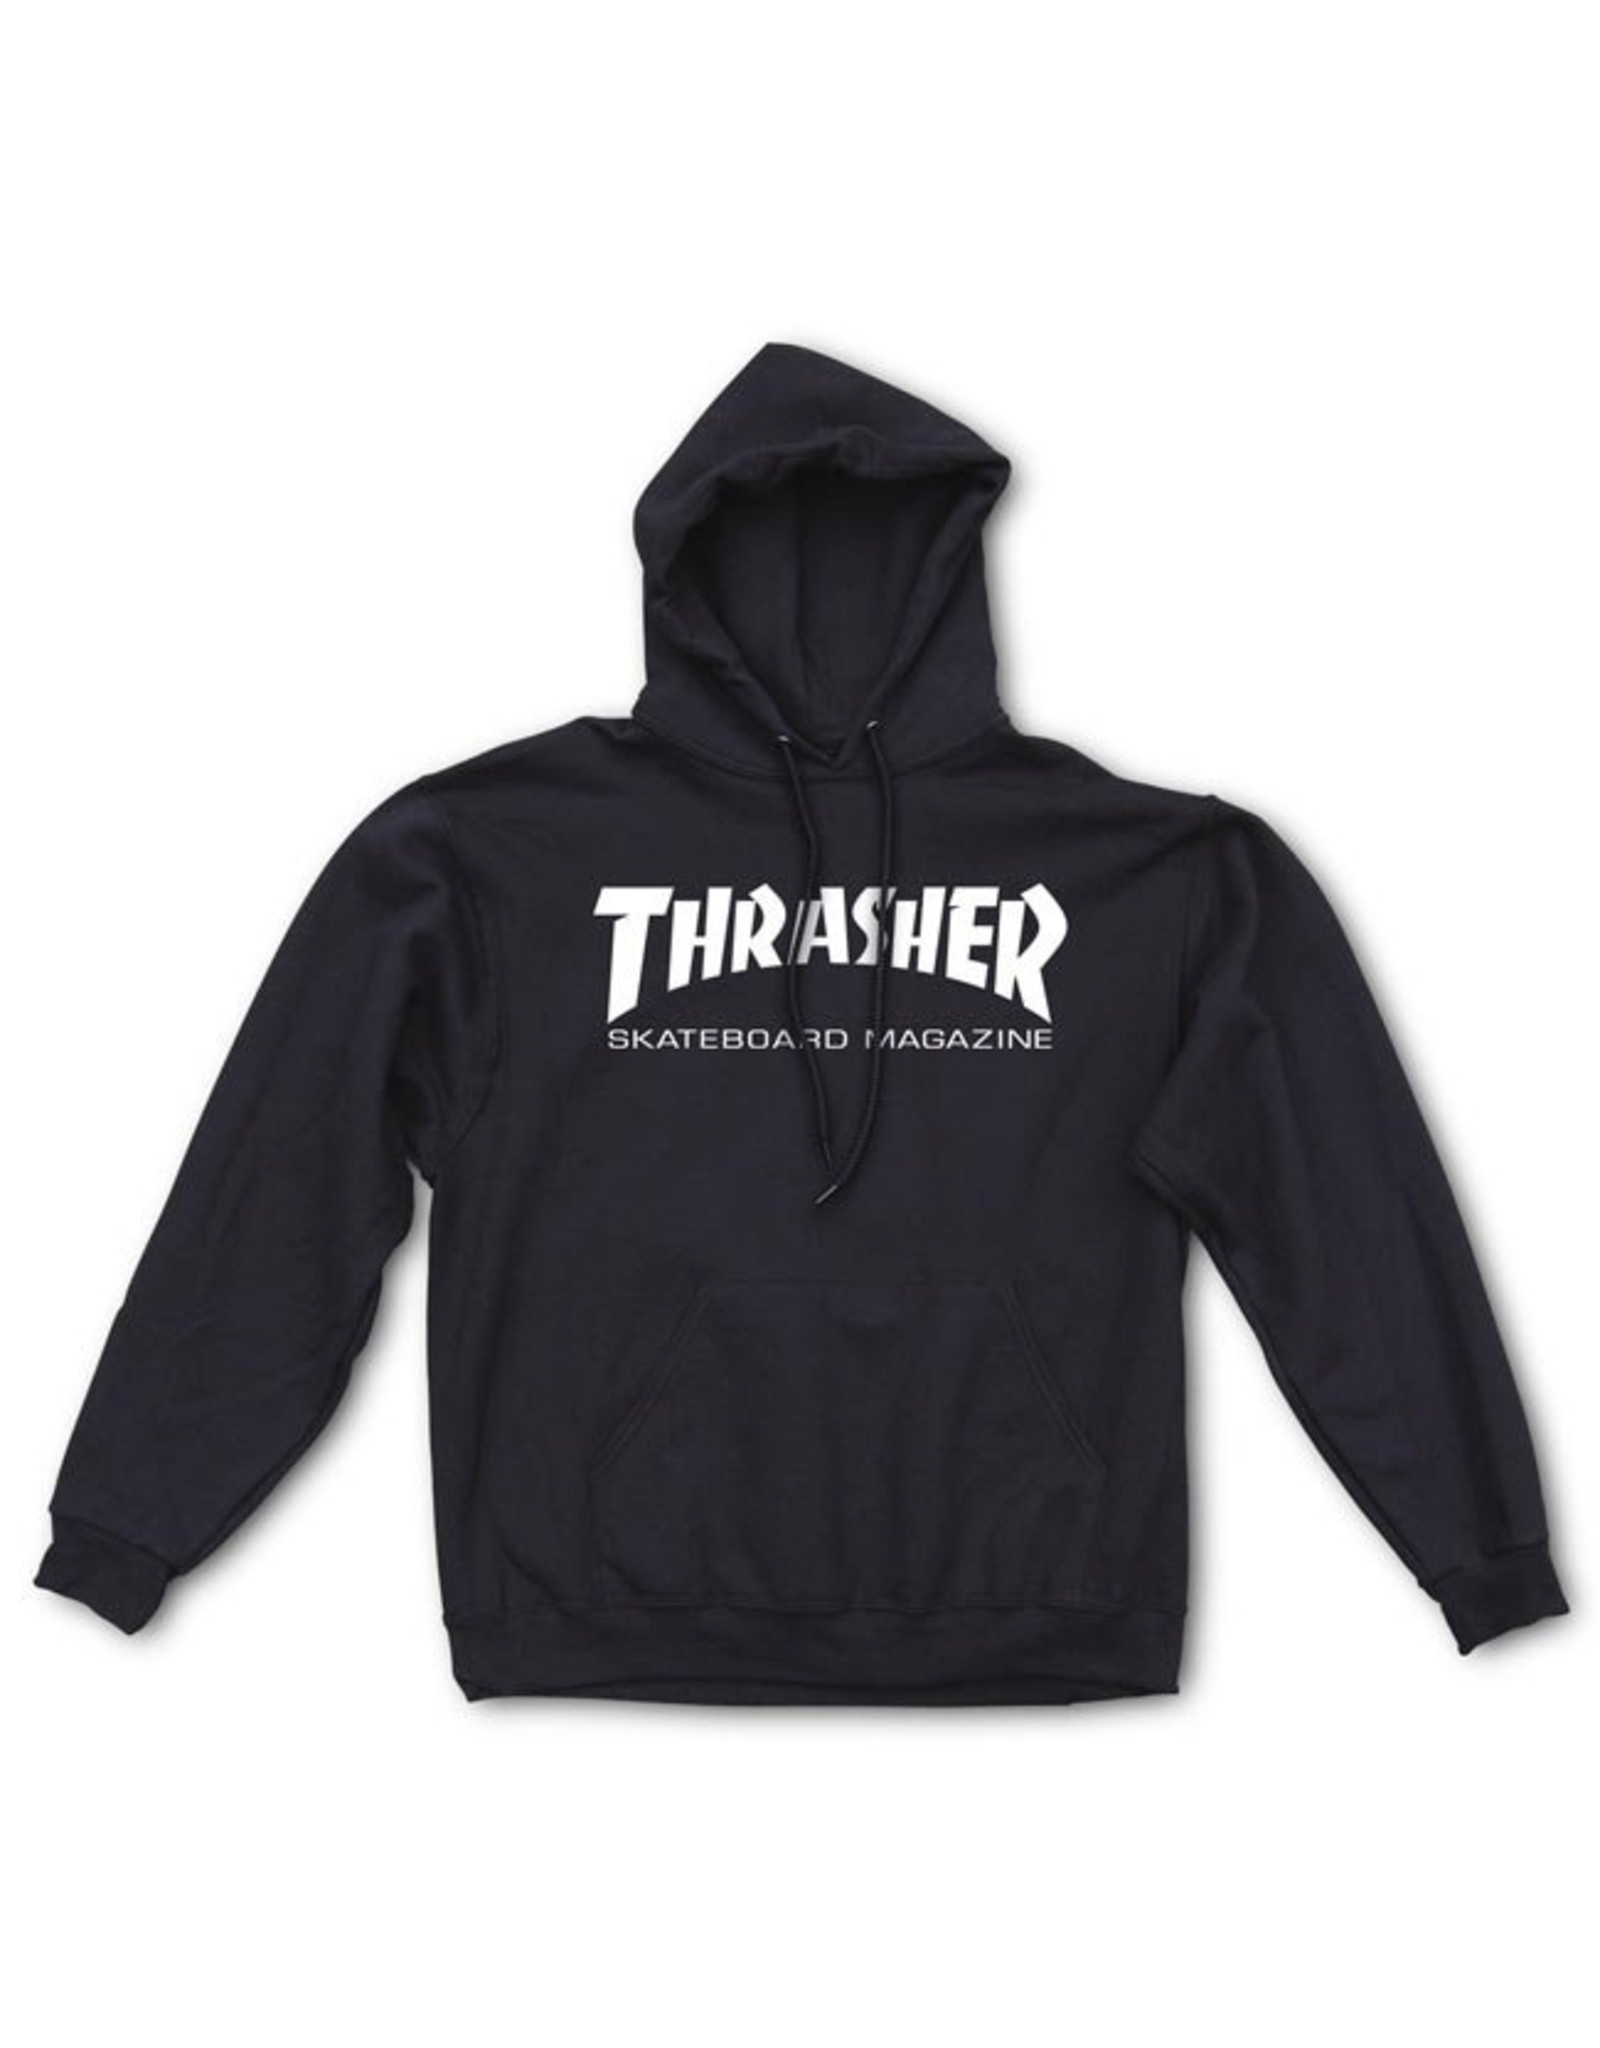 THRASHER THRASHER - SKATE MAG HOODIE - BLACK -